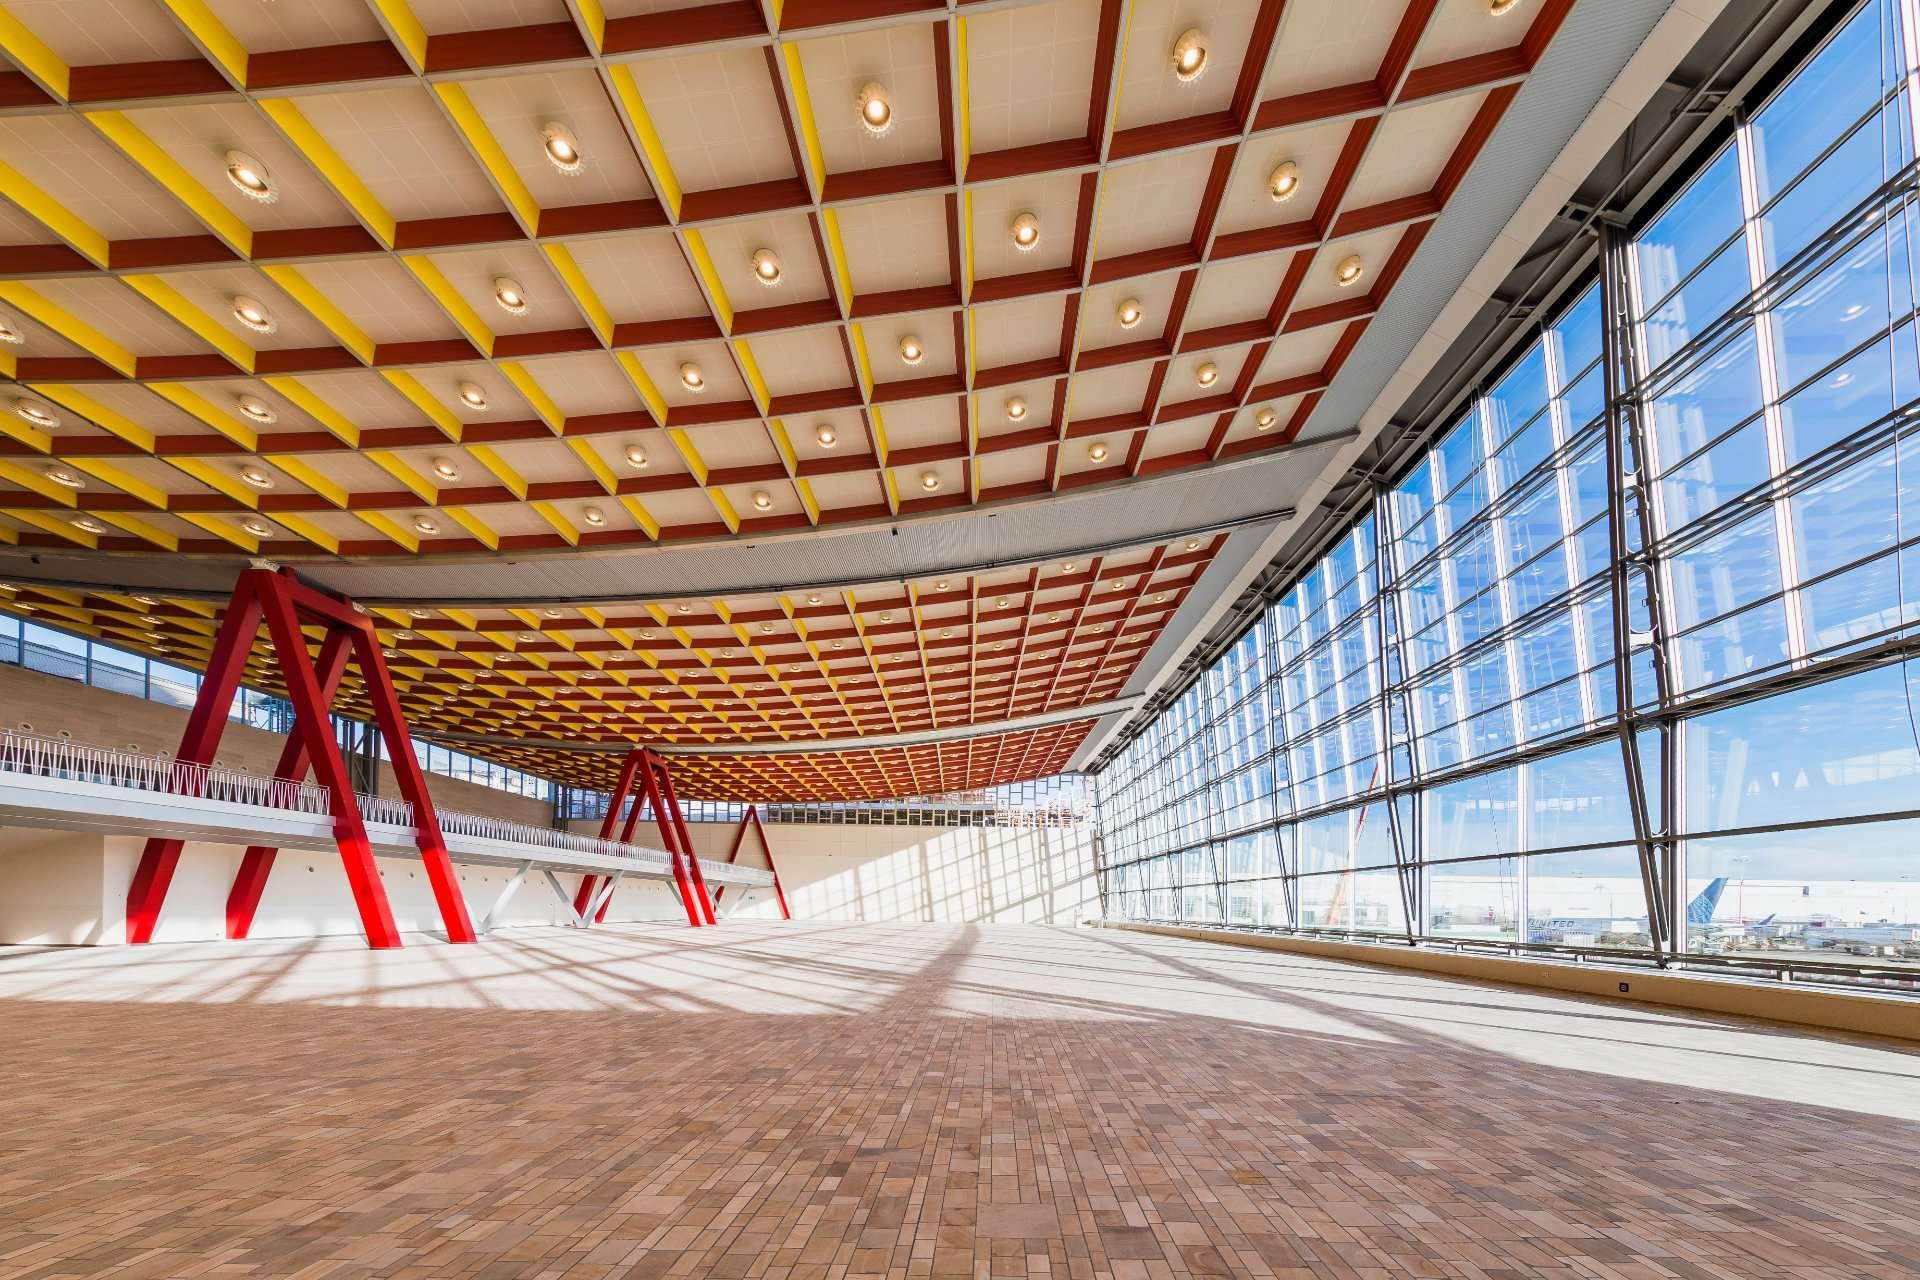 plafonds-Skyhall-Zaventem